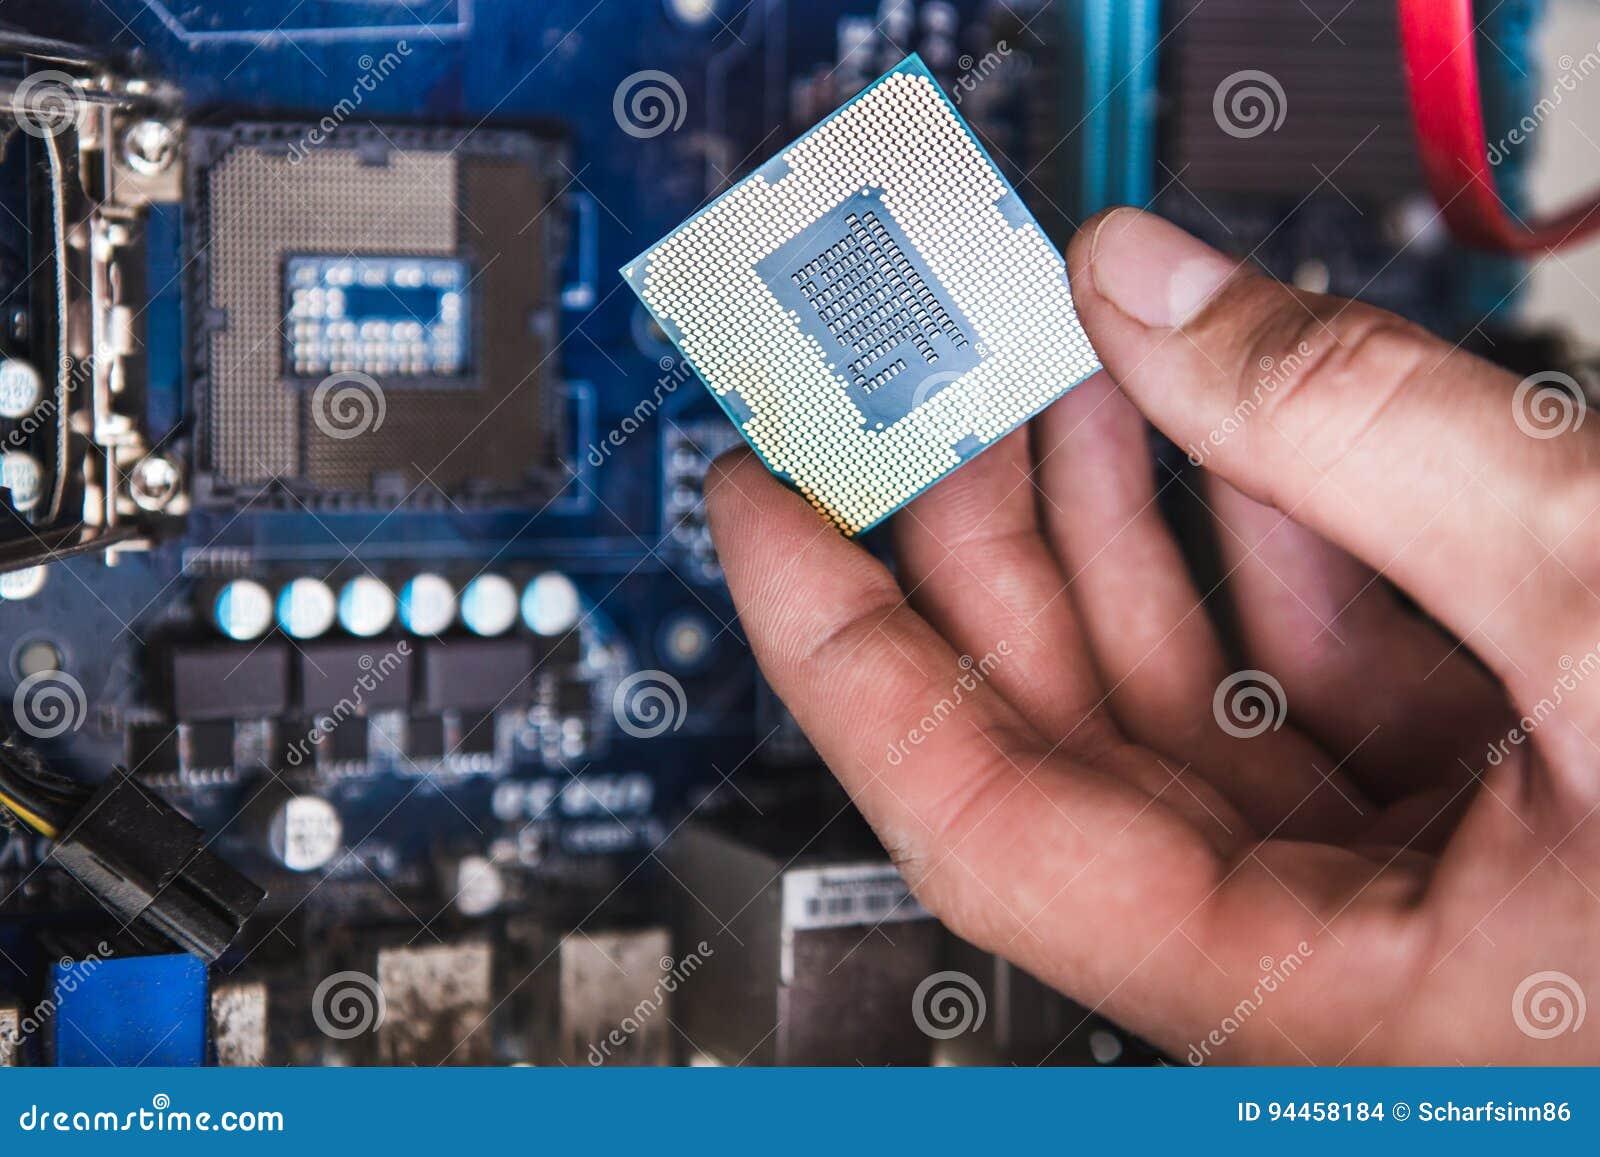 Man Examines Laptop PC Clean Thermal Paste Stock Photo